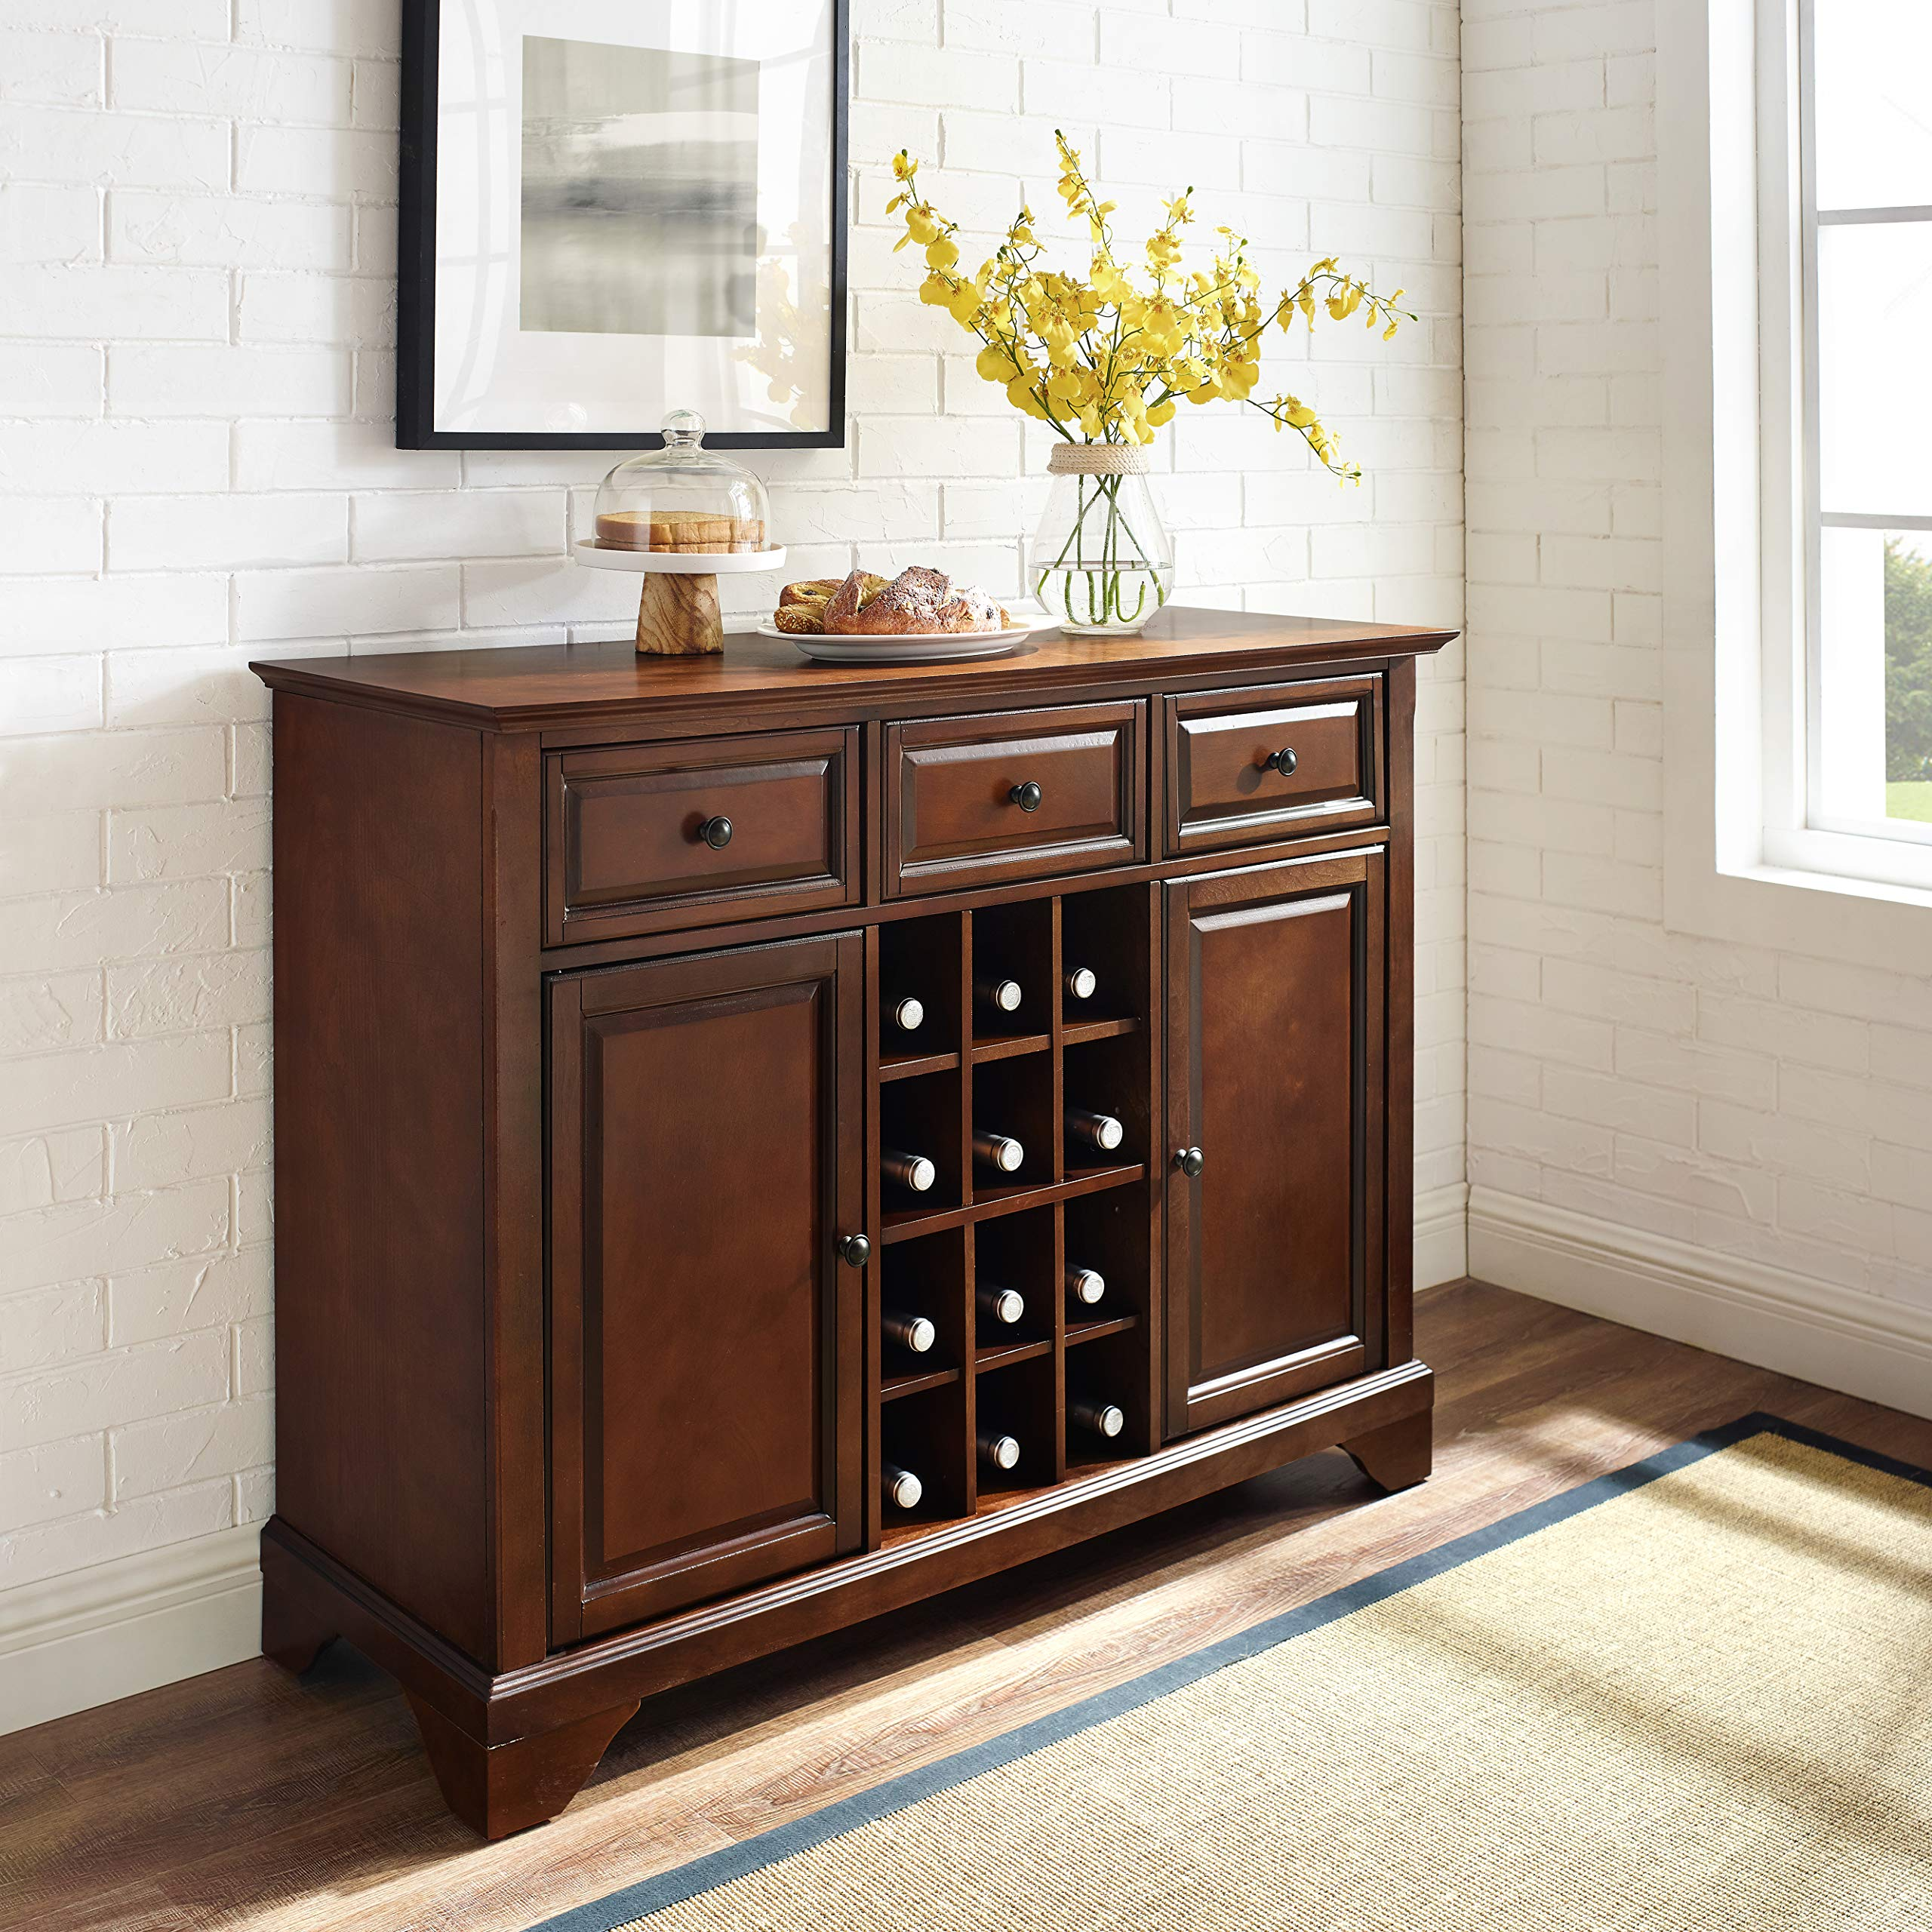 Crosley Furniture LaFayette Wine Buffet / Sideboard - Vintage Mahogany by Crosley Furniture (Image #6)